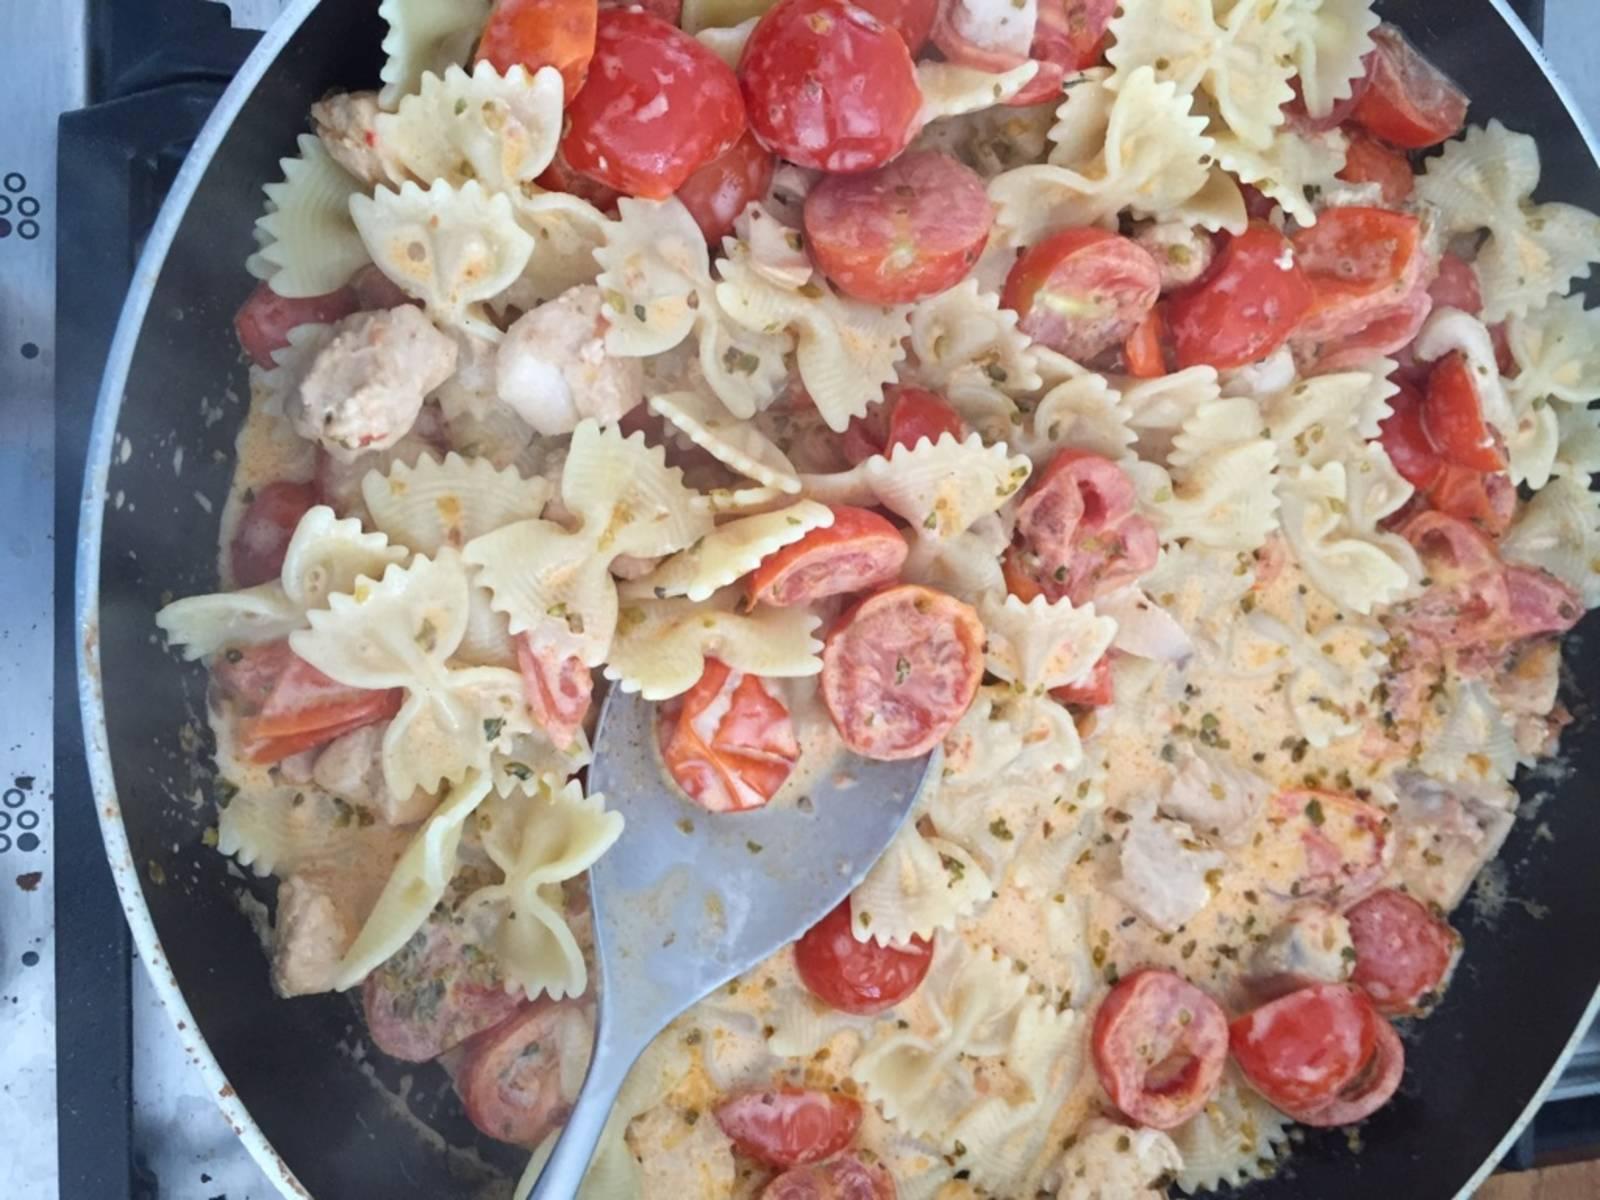 Add pasta and serve.